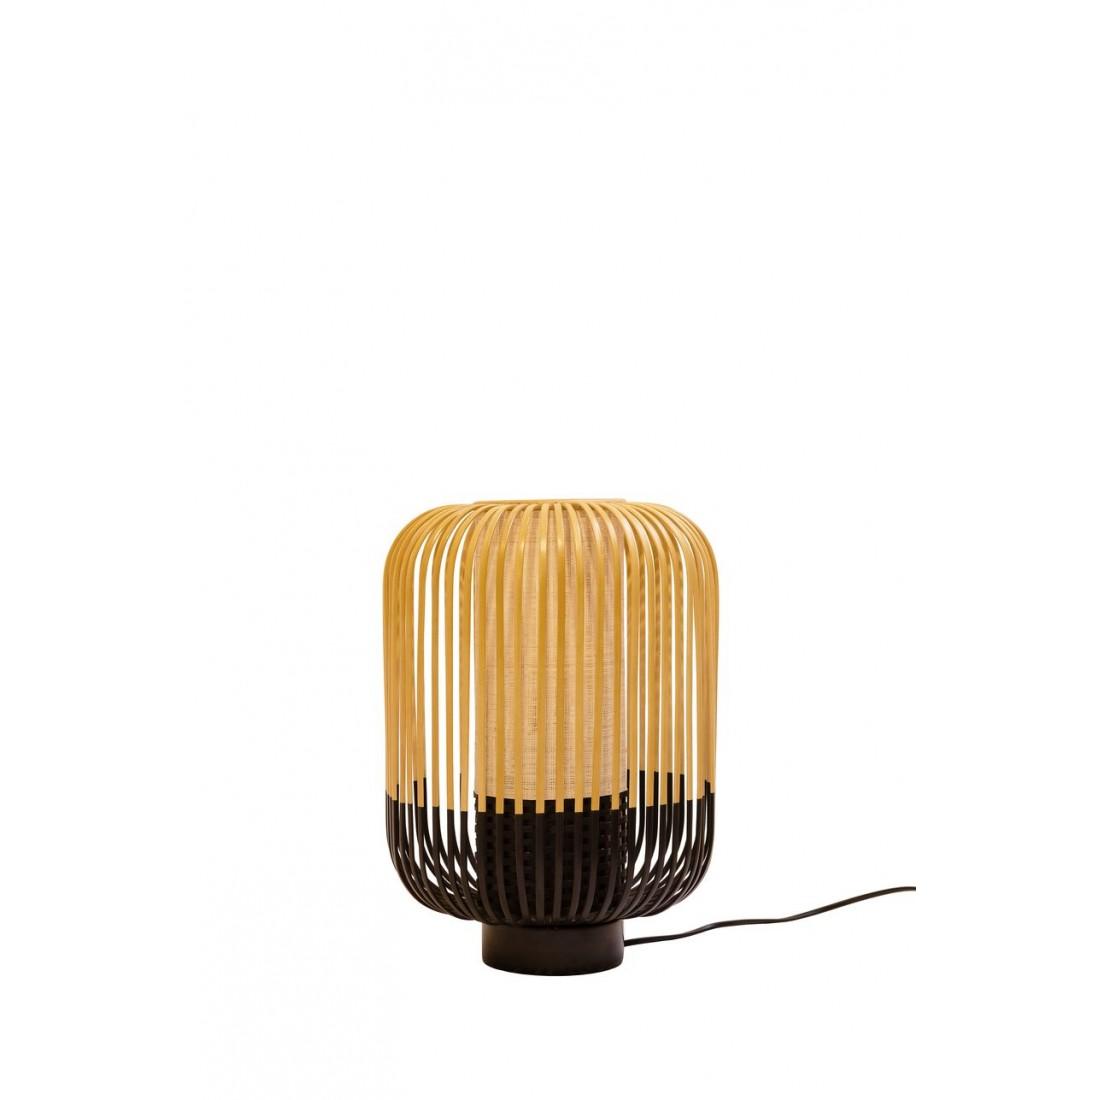 Lampe à poser Bamboo M - Forestier